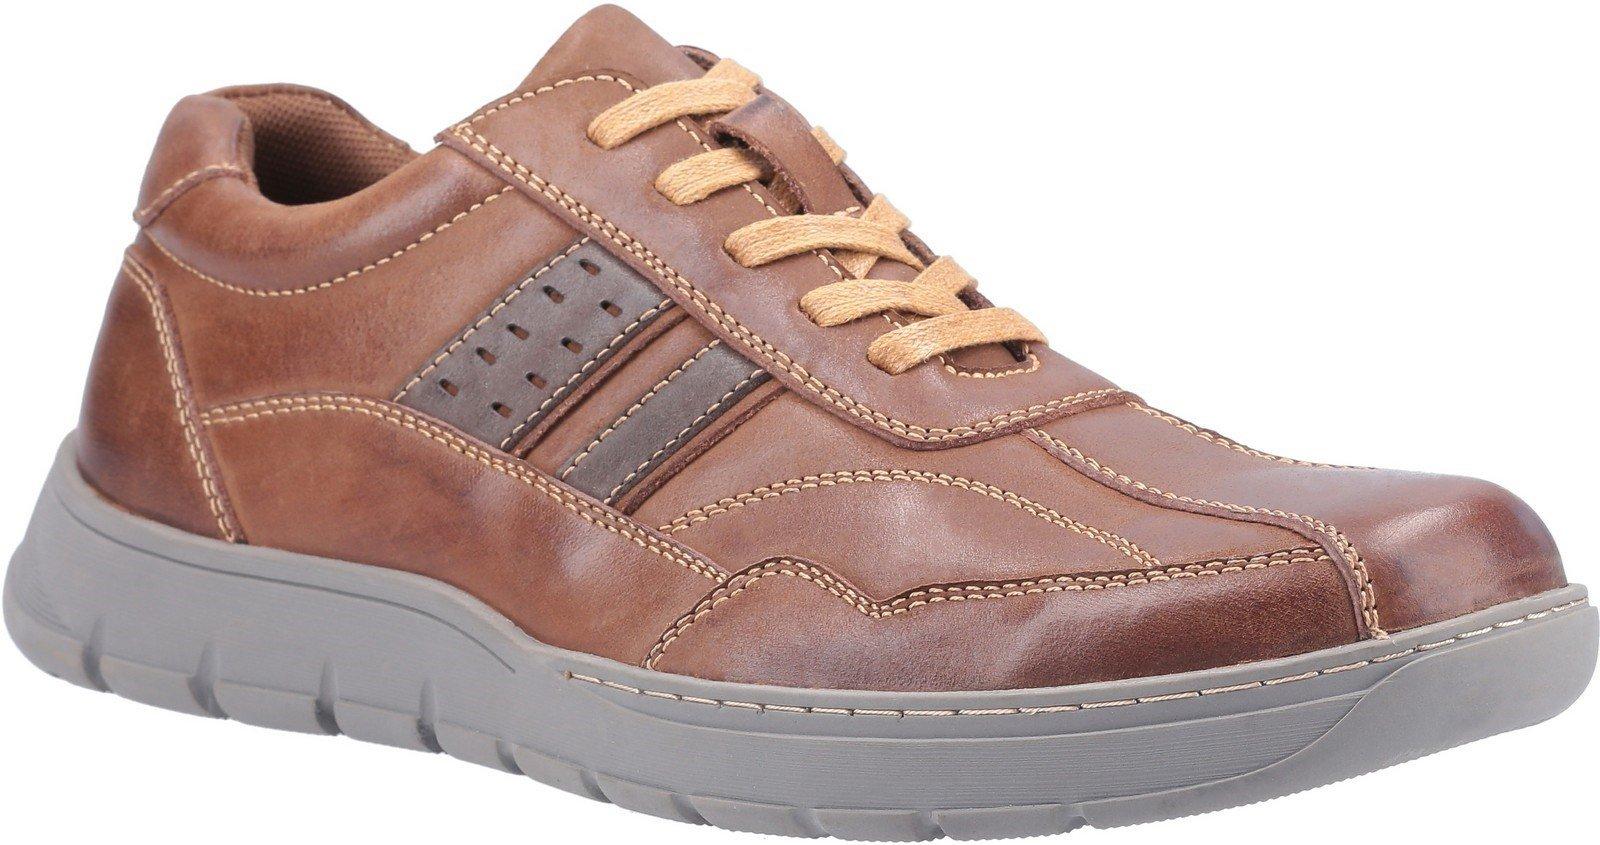 Fleet & Foster Men's Harrison Lace Up Shoe Trainer 30259-51532 - Brown 6.5